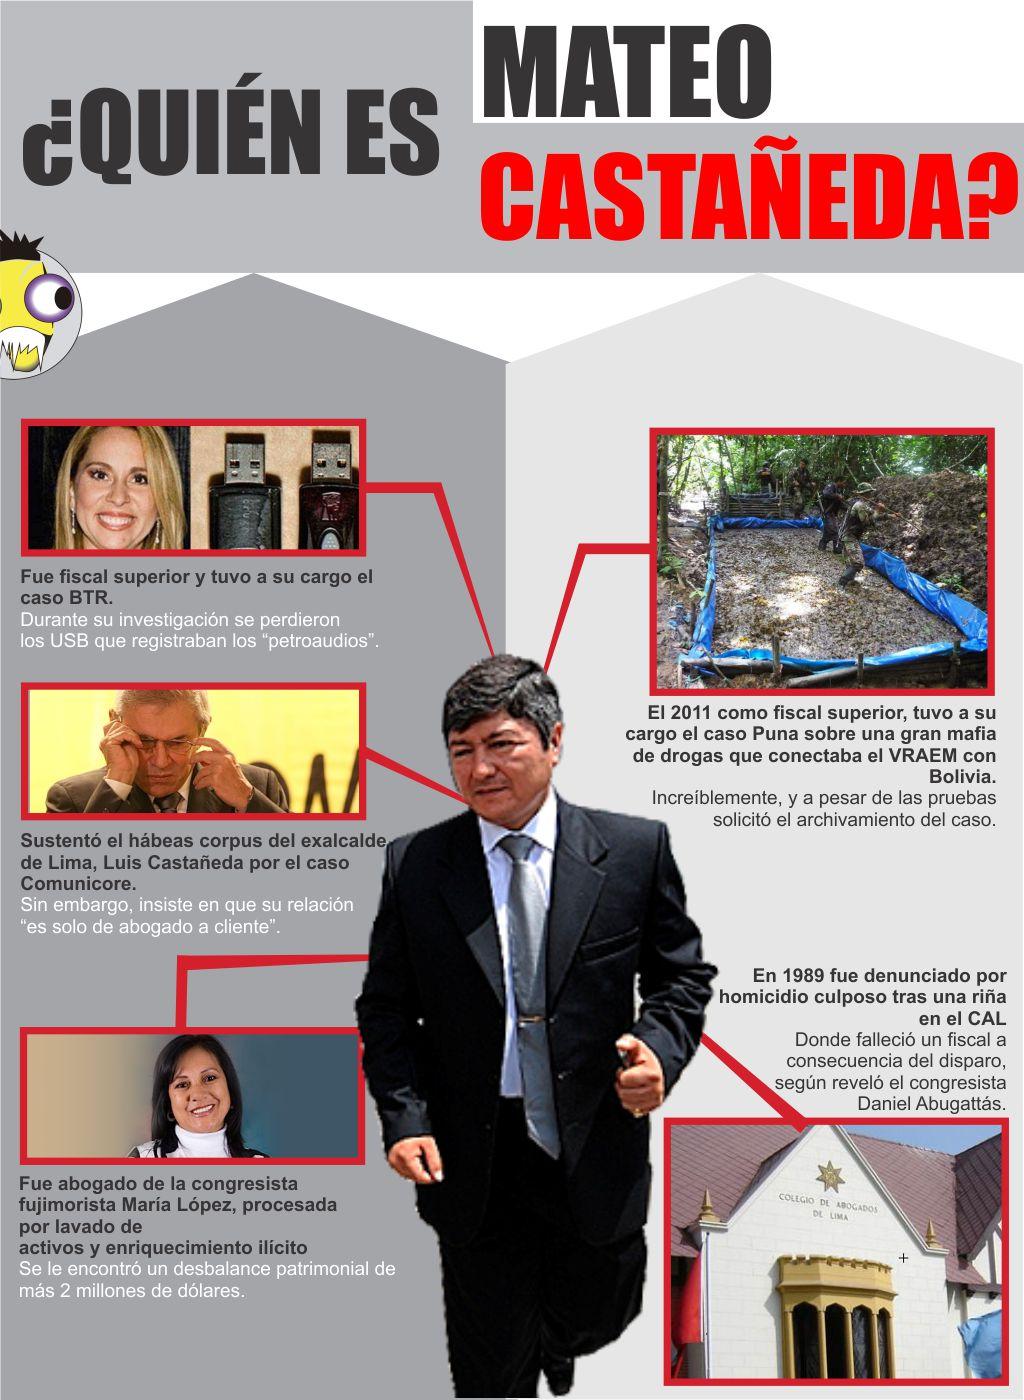 Ojo al Piojo - Quién es Mateo Castañeda